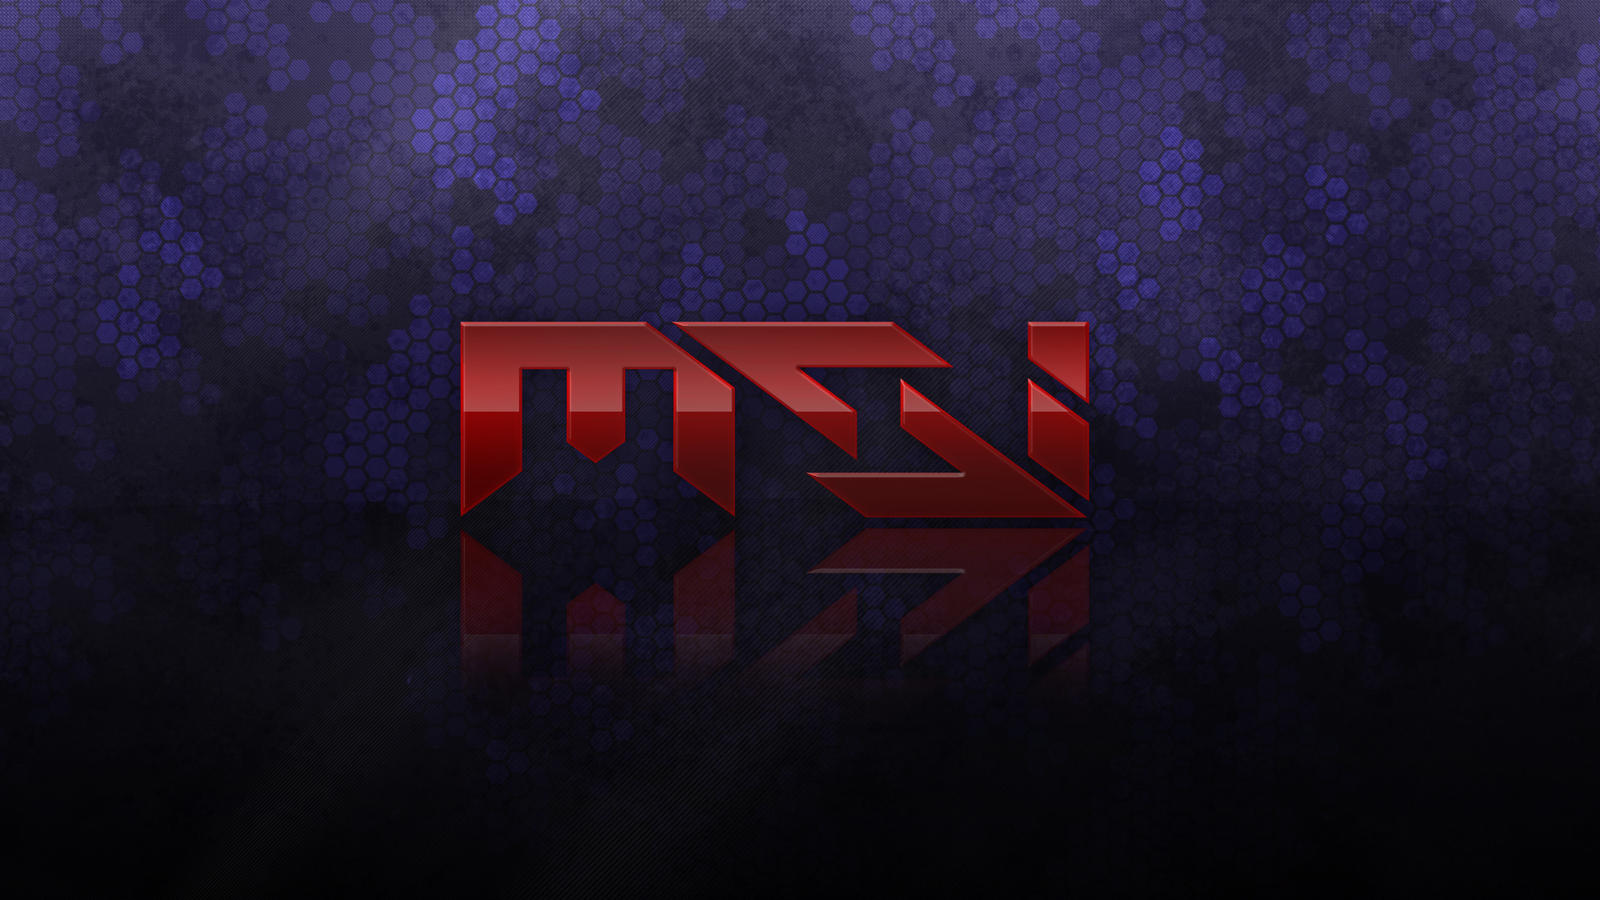 Msi Gaming Wallpaper 2 By Valencygraphics On Deviantart